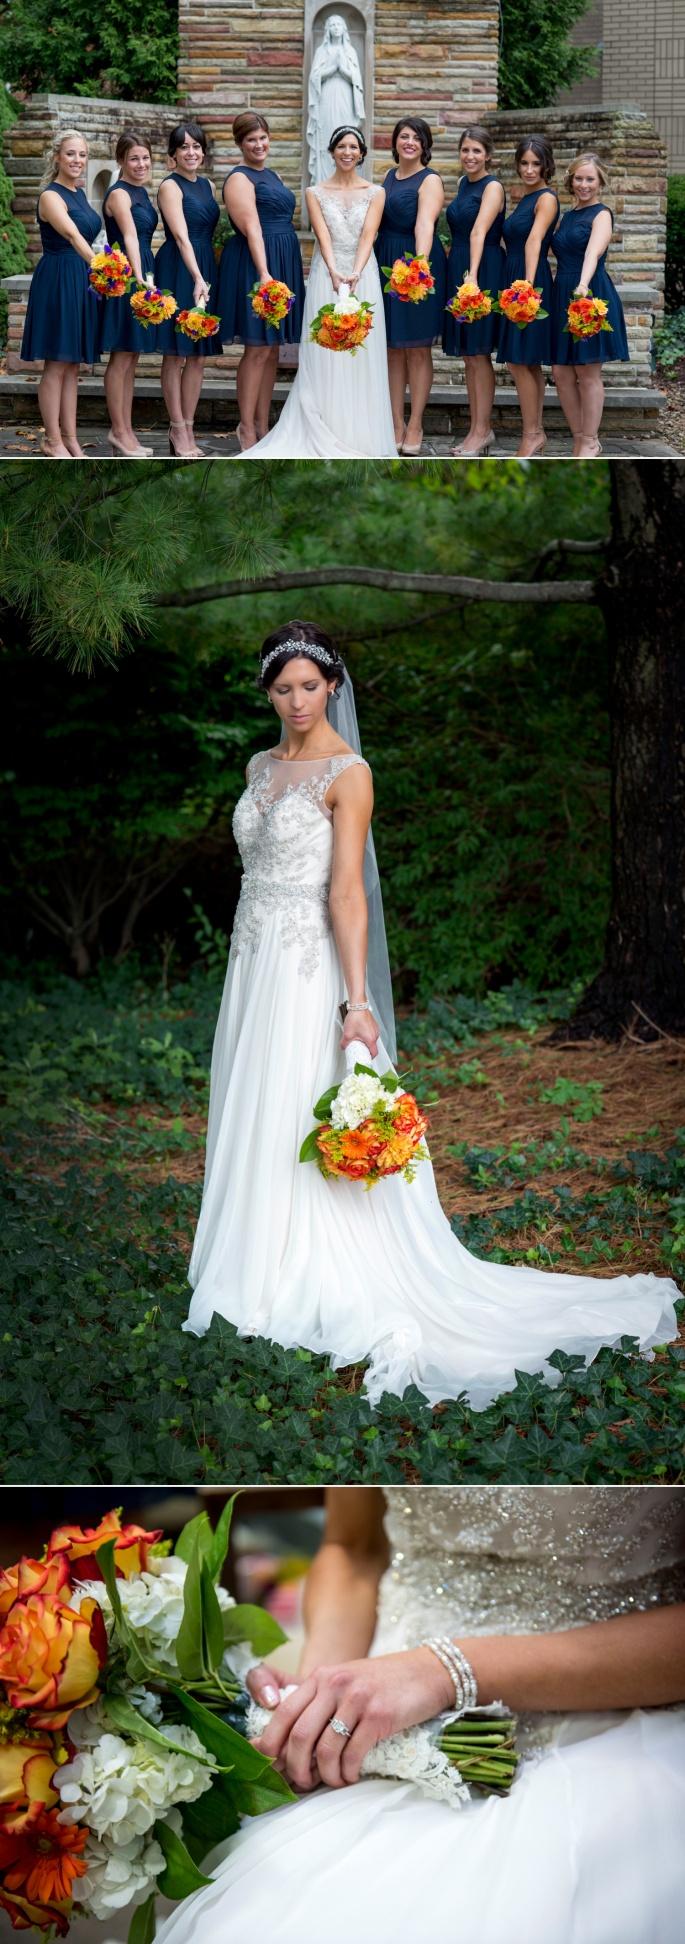 navy tea length bridesmaid dresses and fall flowers